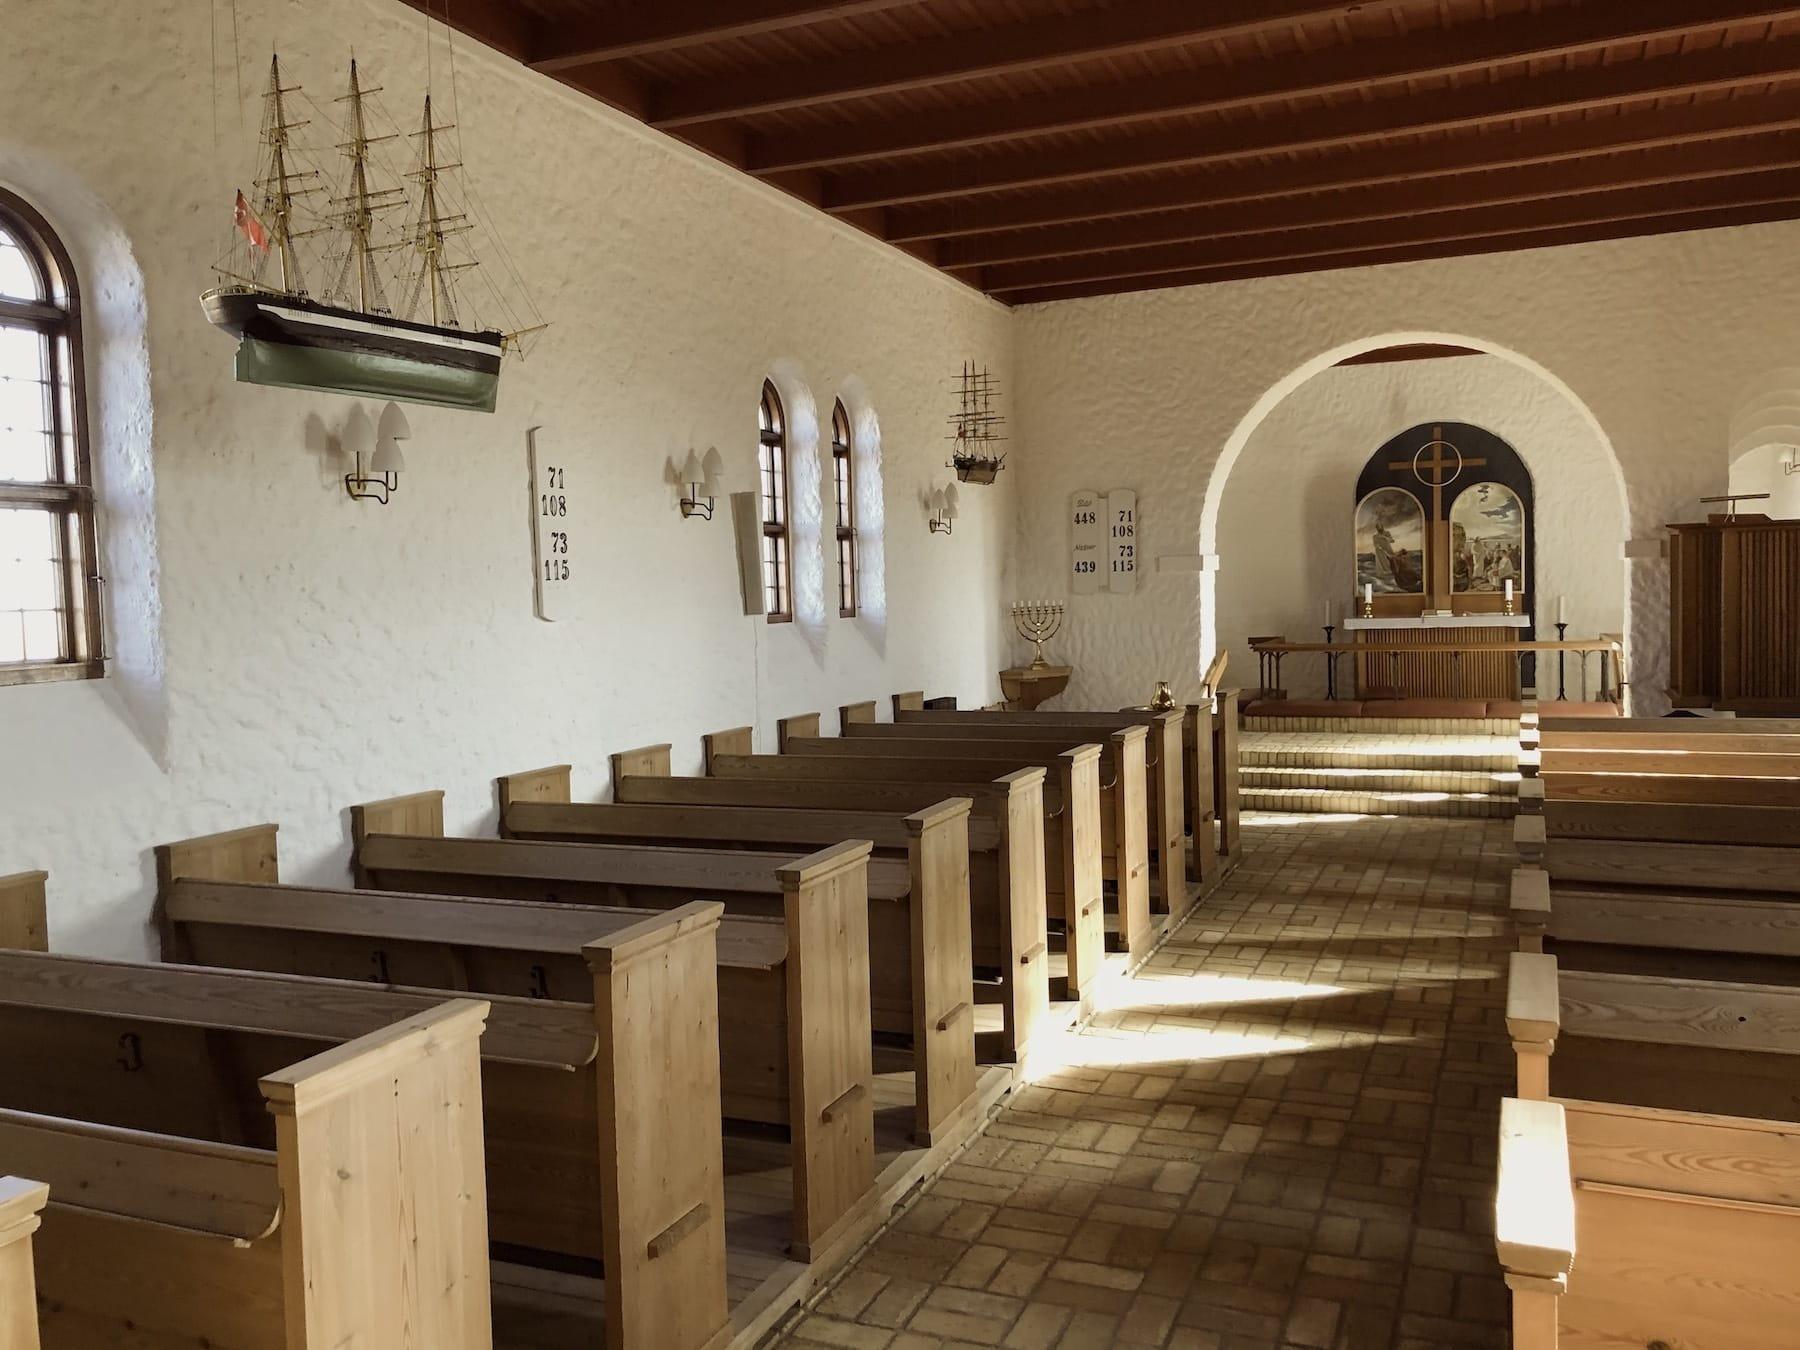 Nørre Lyngvig Kirke har flere skibe i kirkerummet. Skibene er givet til minde om forlis